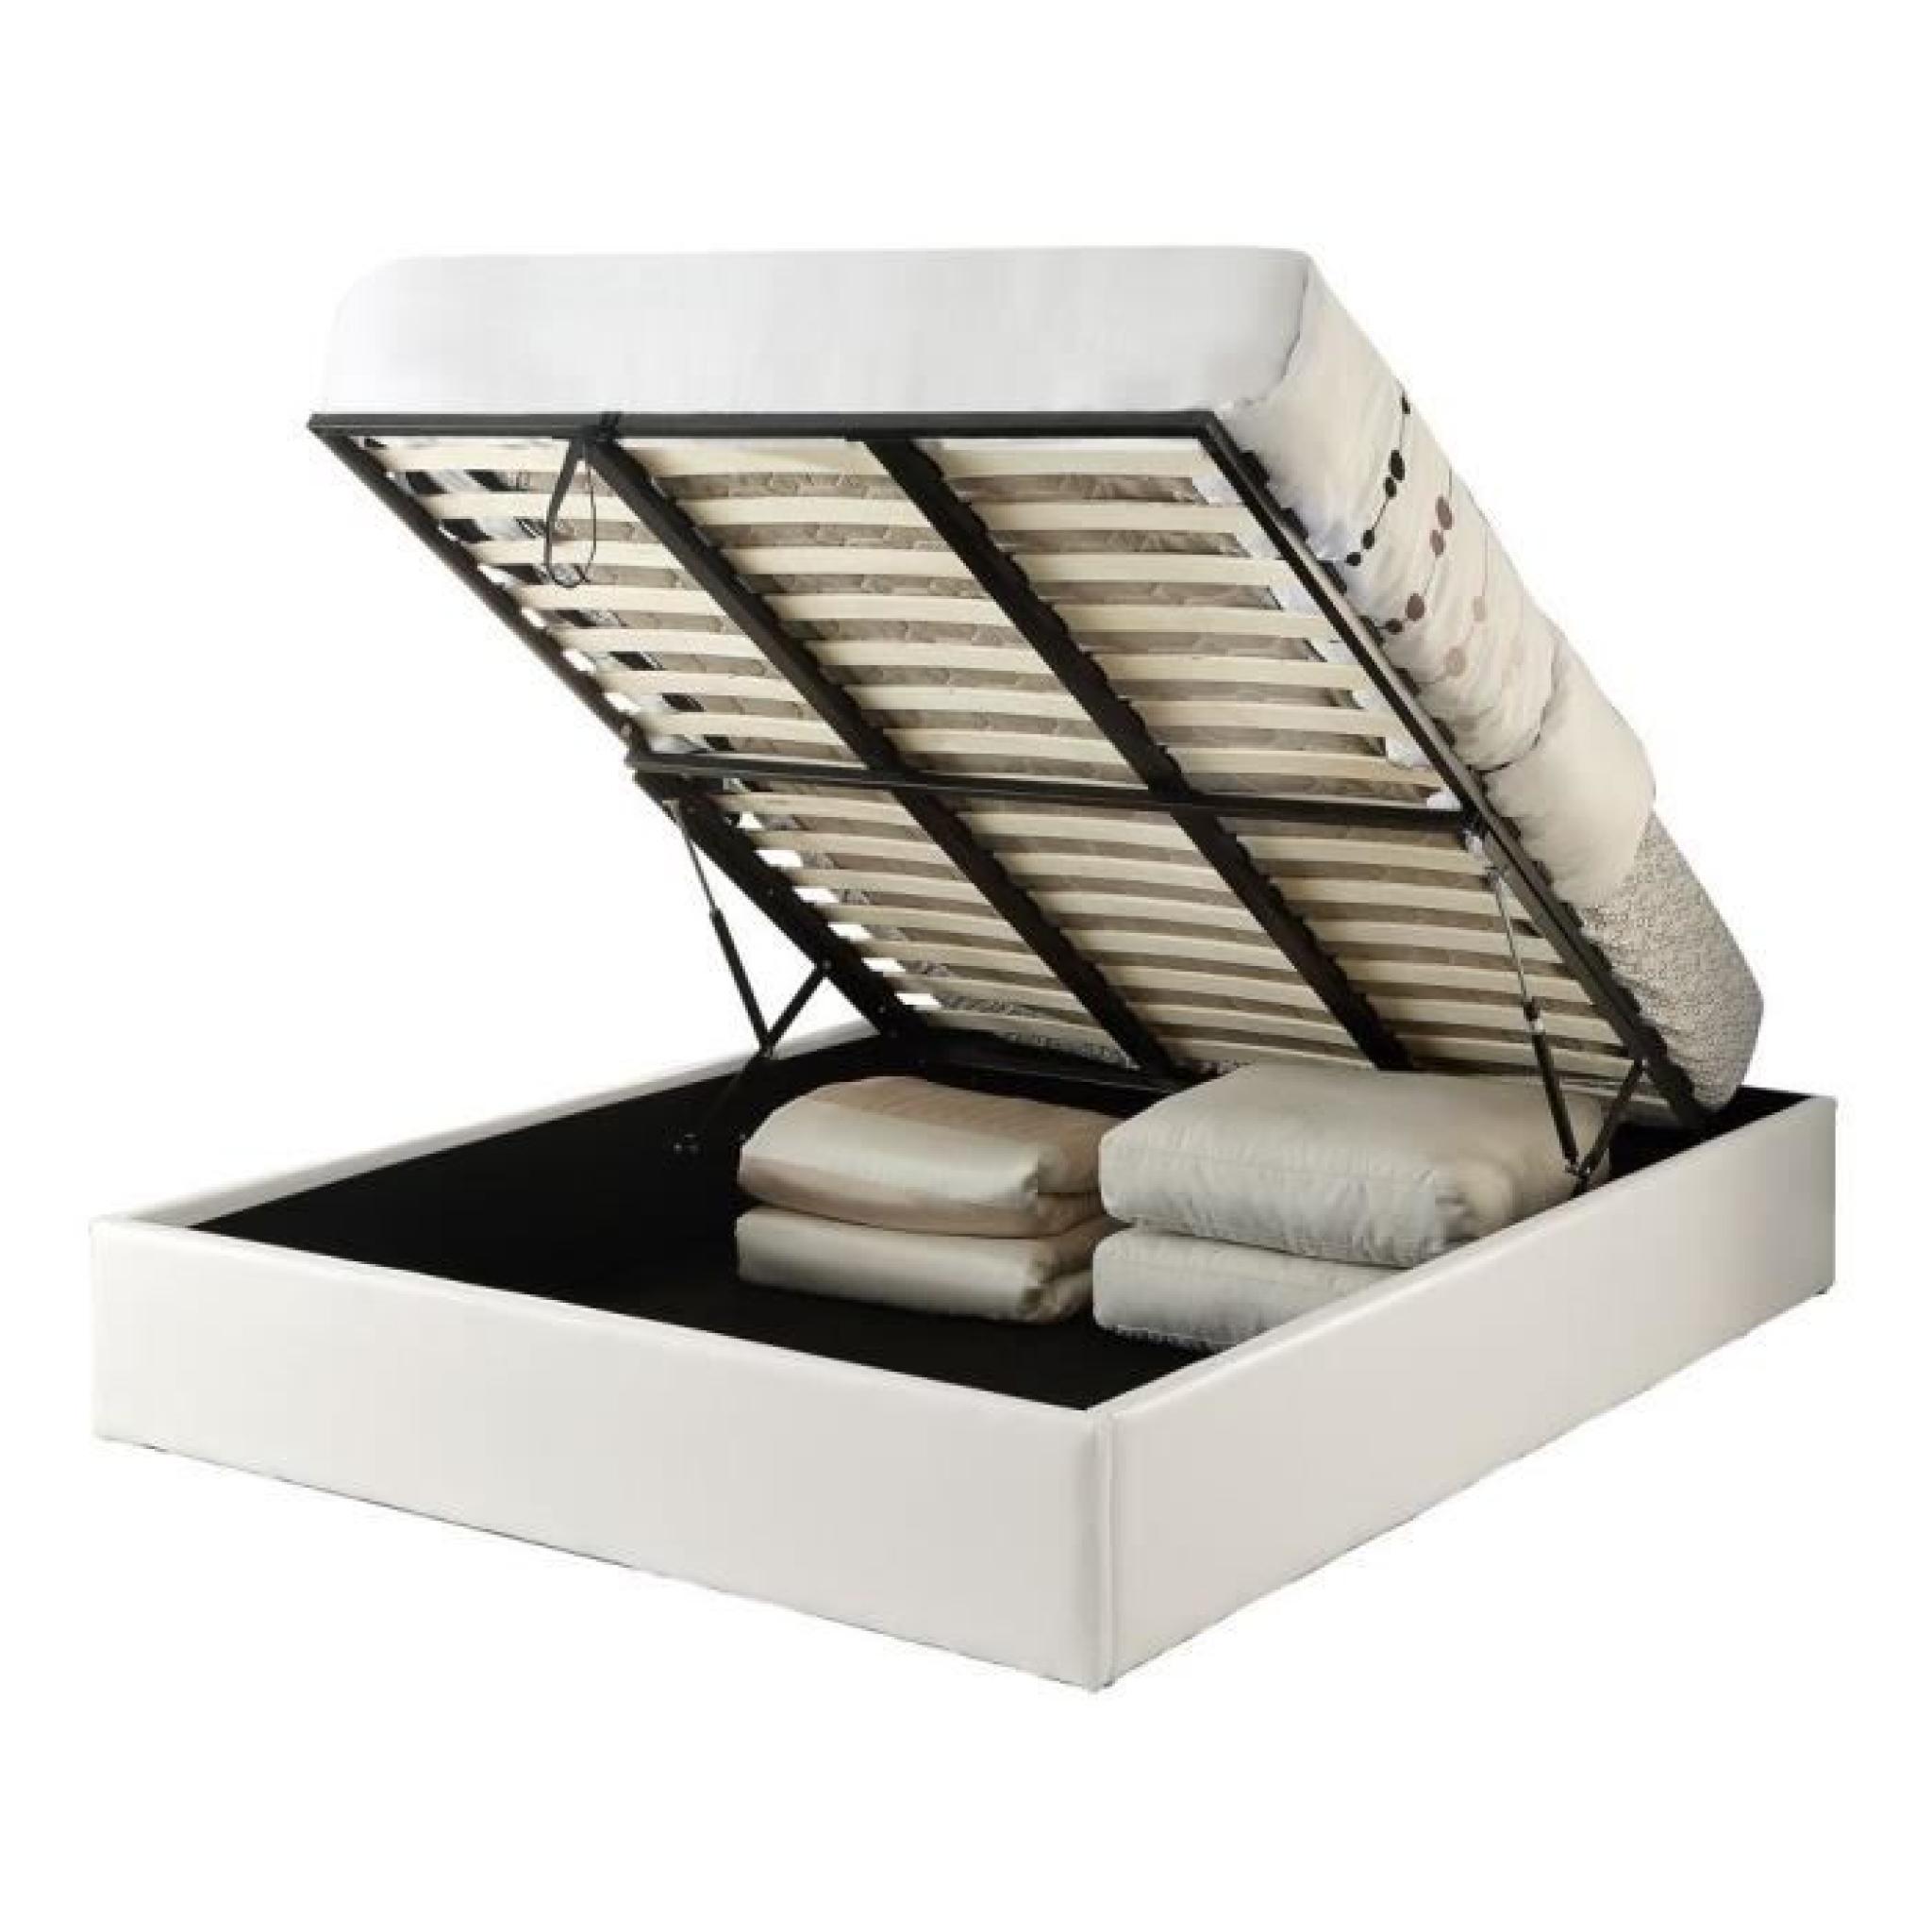 majesty lit coffre adulte 140x190 + sommier blanc - achat/vente lit